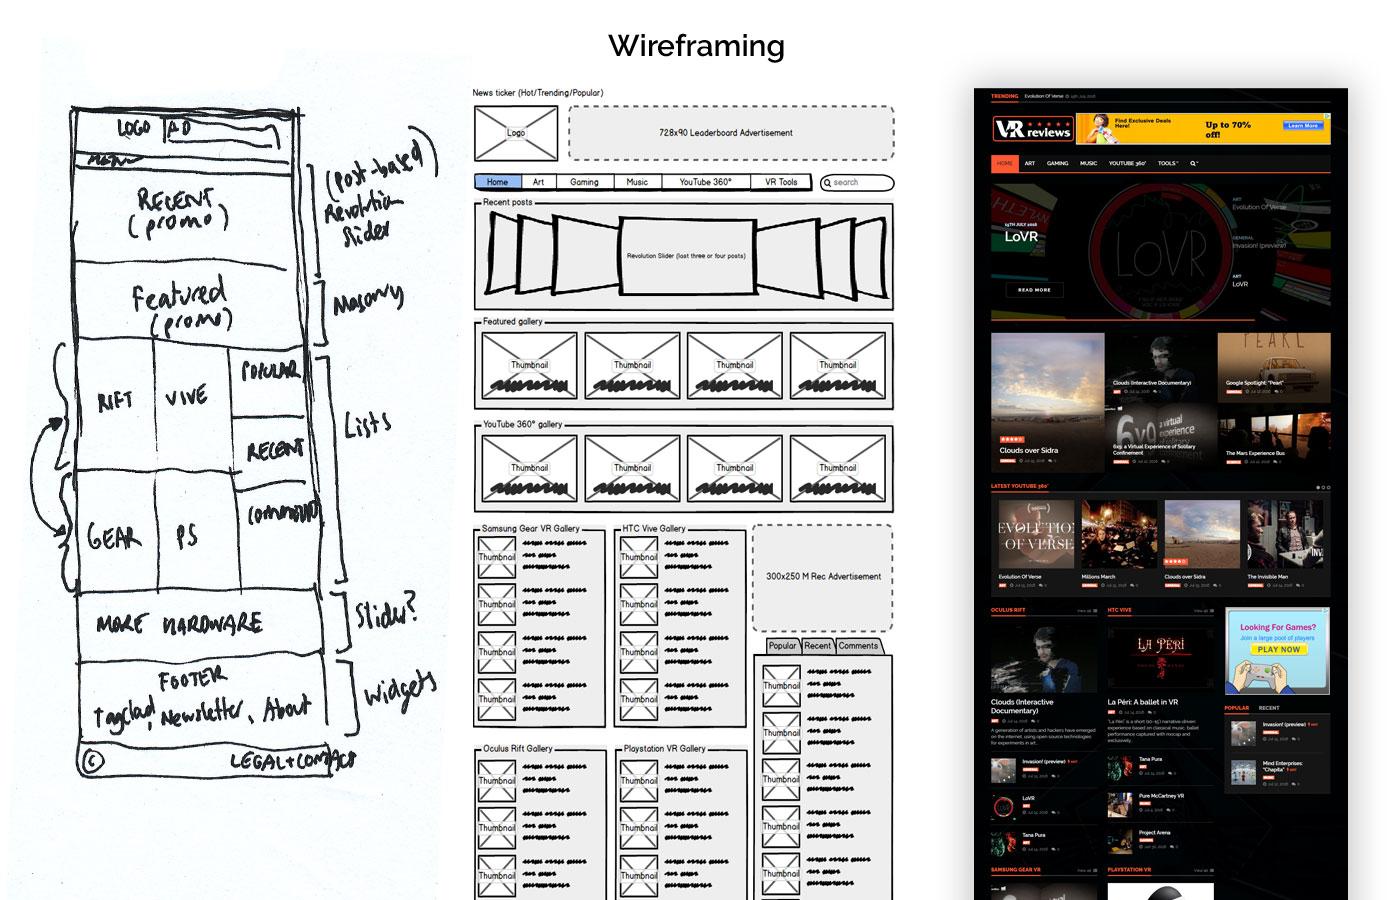 v-r.reviews - wireframing